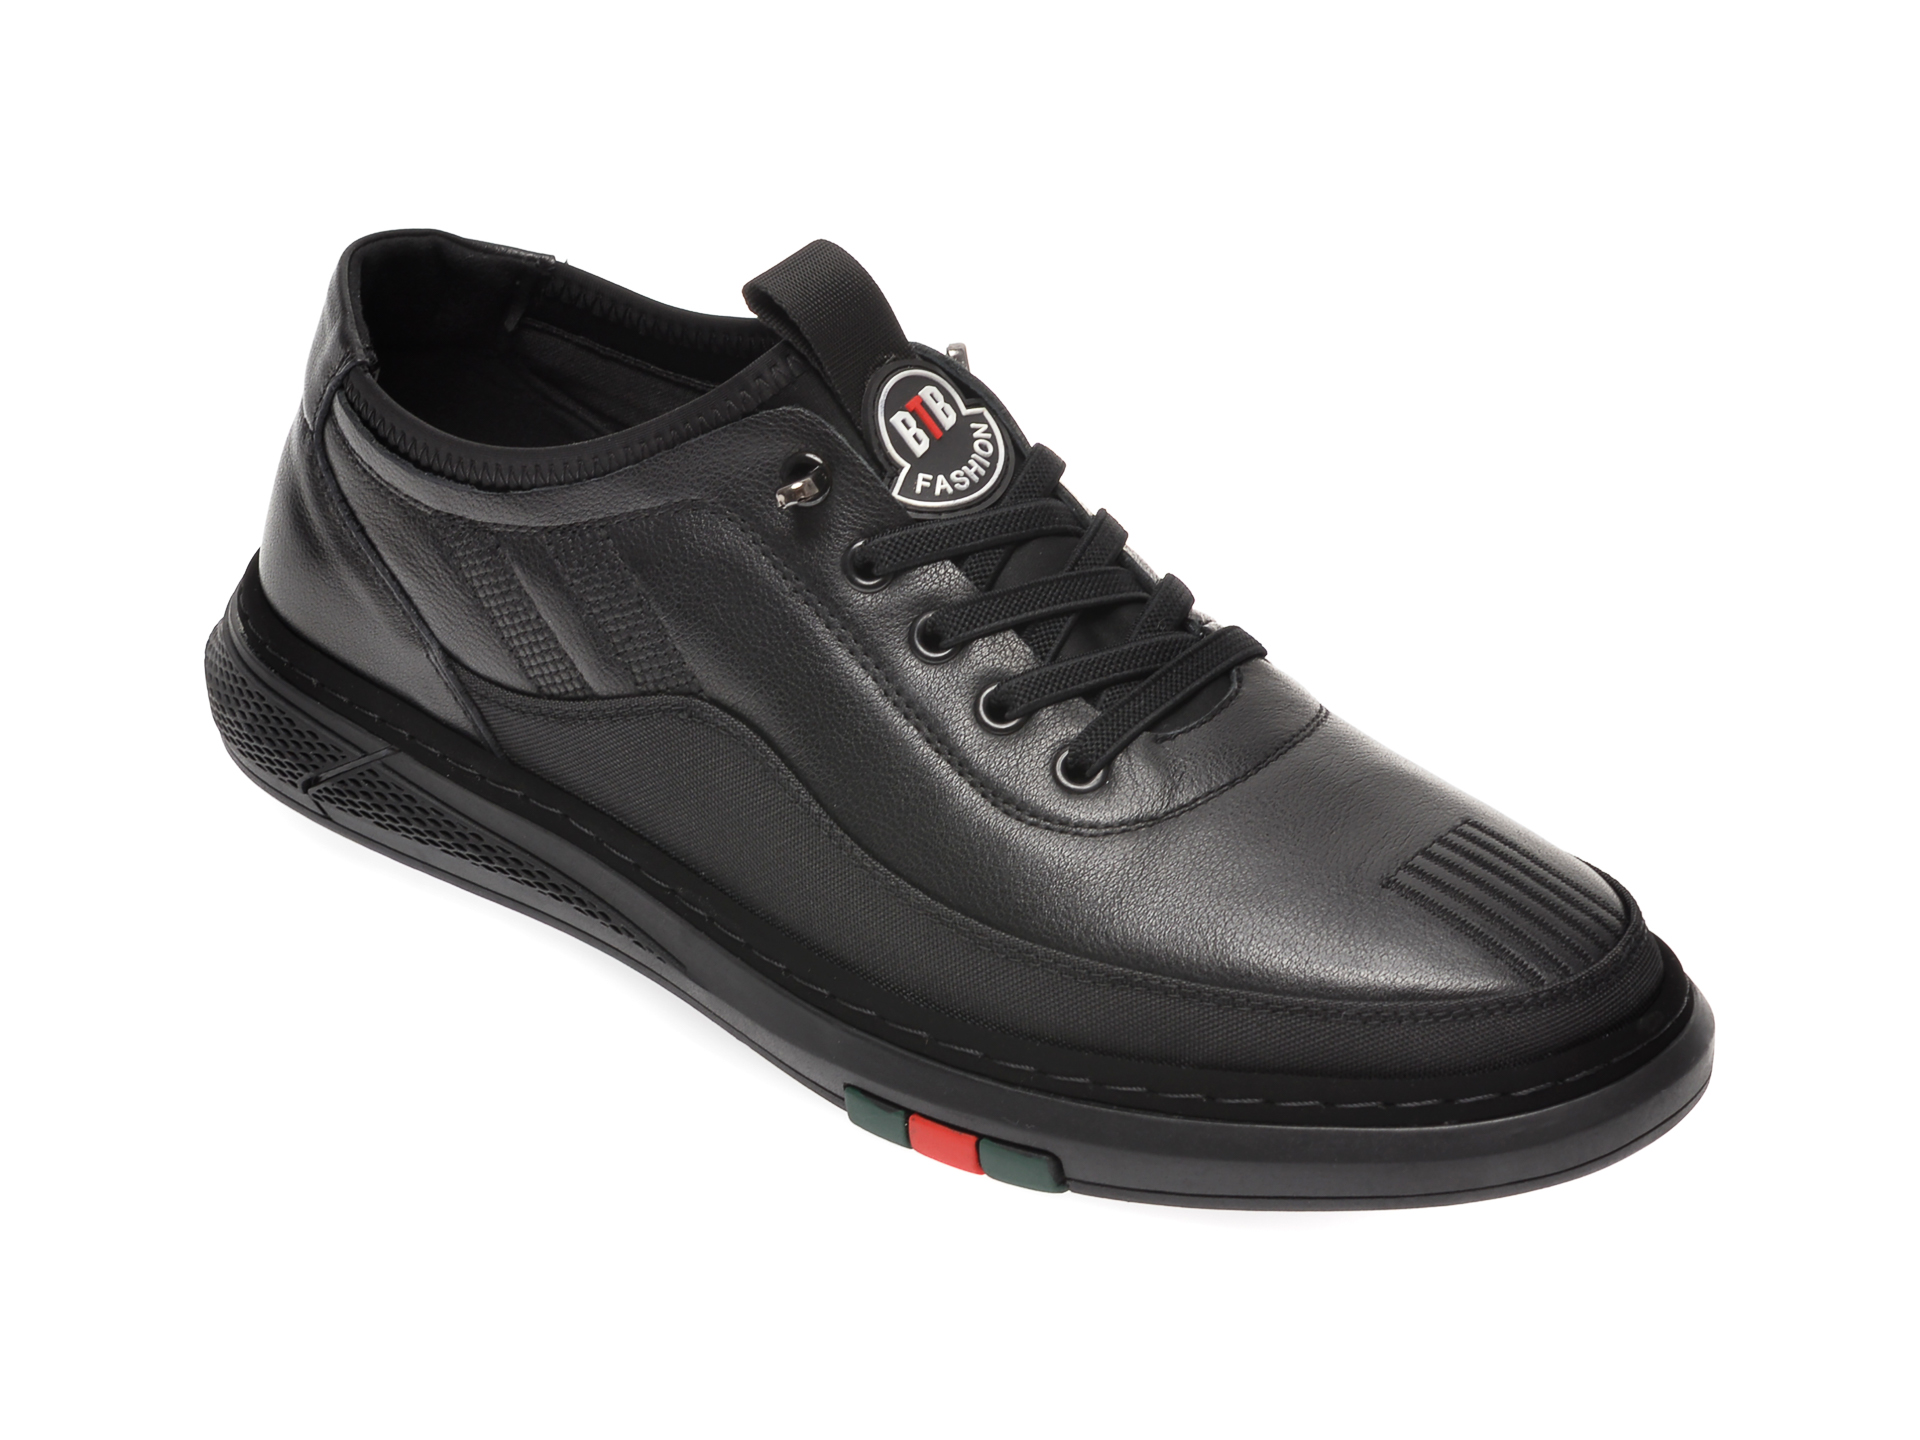 Pantofi BITE THE BULLET negri, 938281, din piele naturala imagine